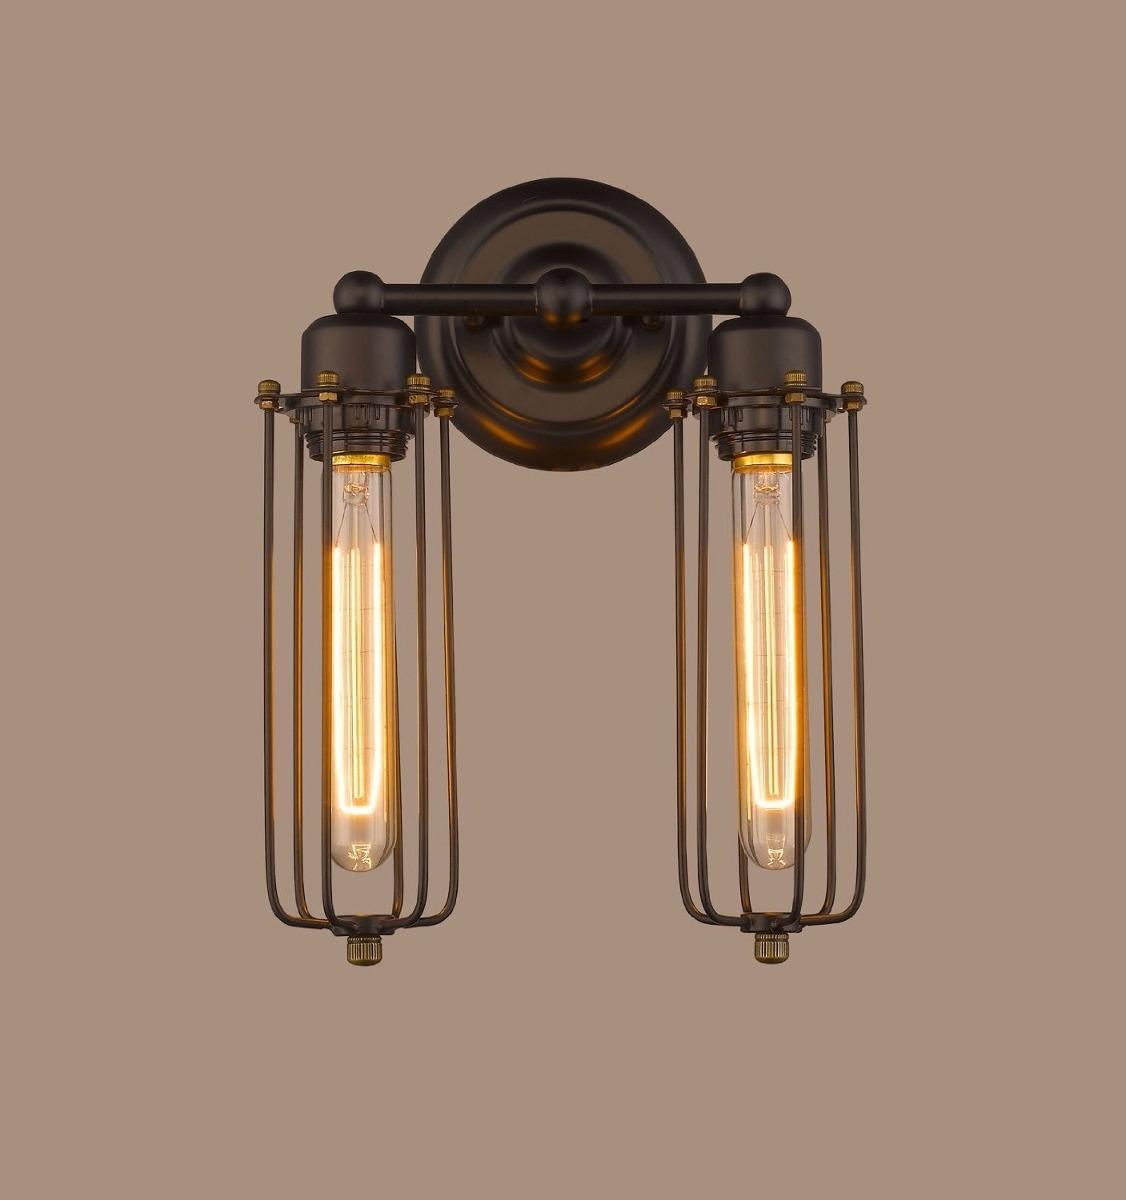 L mpara tipo jaula pared vintage 2 luces bulbos edison - Lampara tipo industrial ...